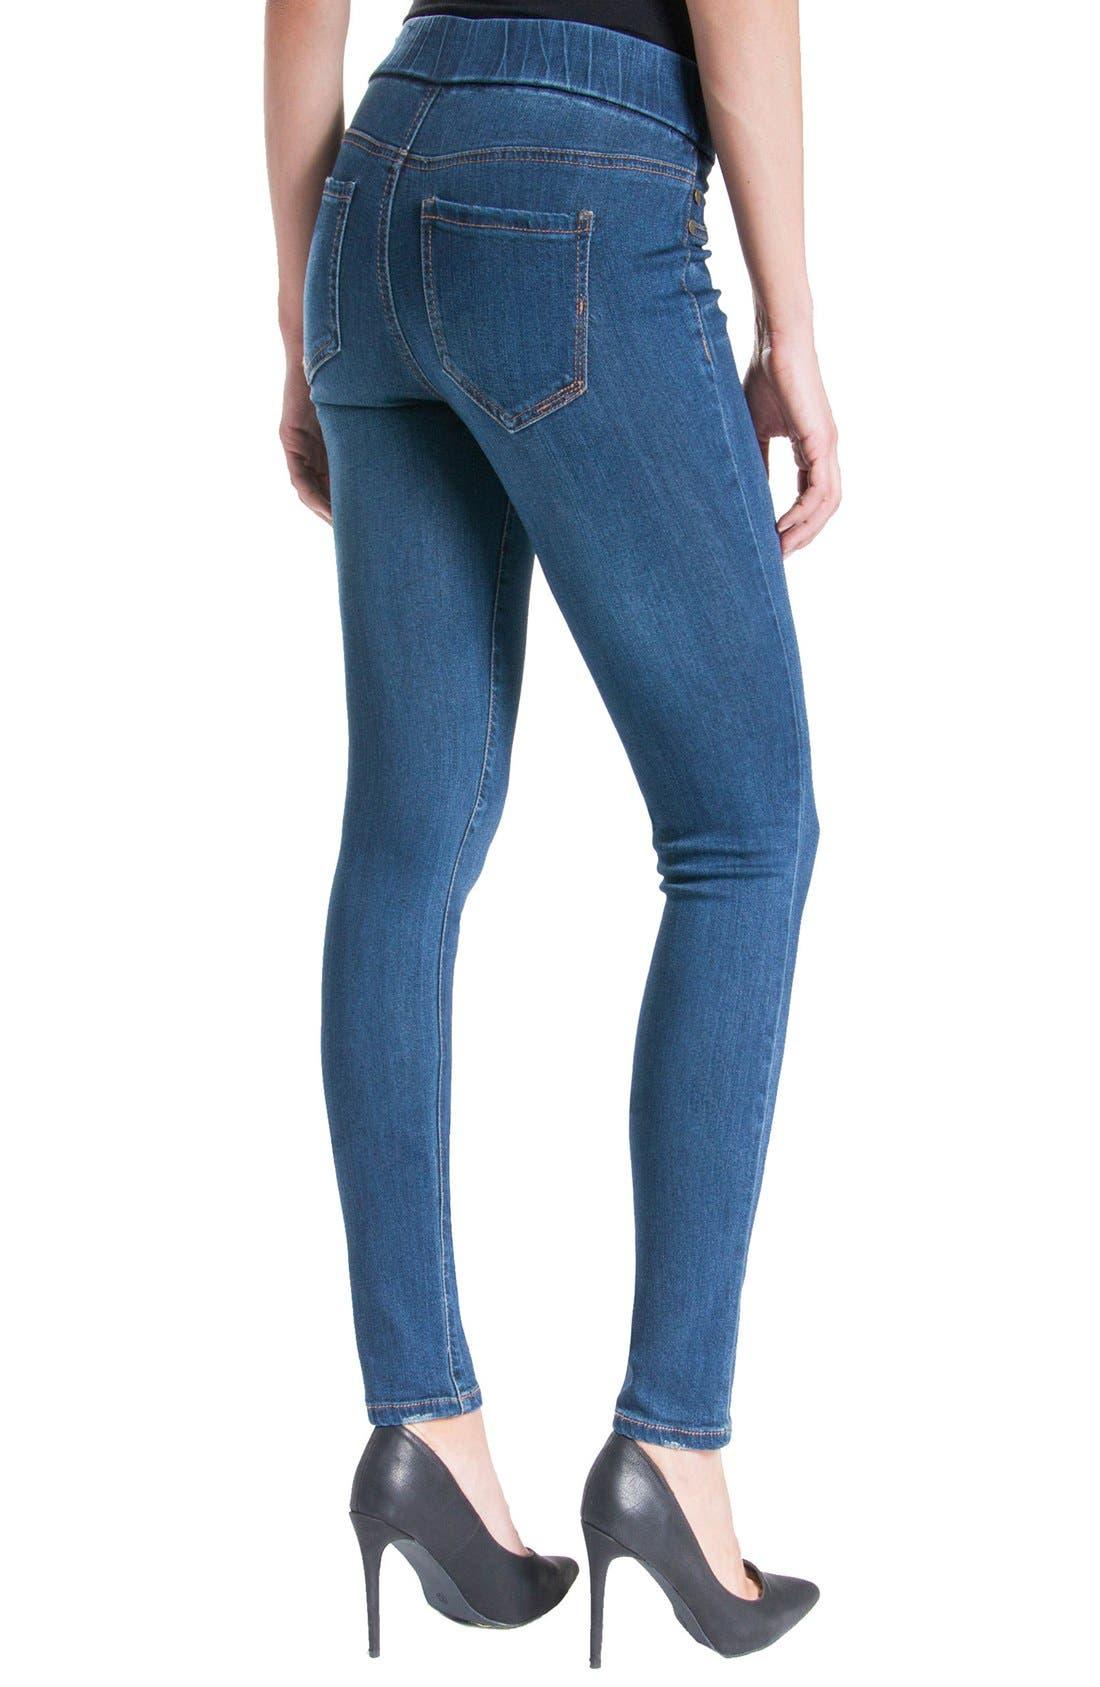 Jeans Company Sienna Mid Rise Soft Stretch Denim Leggings,                             Alternate thumbnail 14, color,